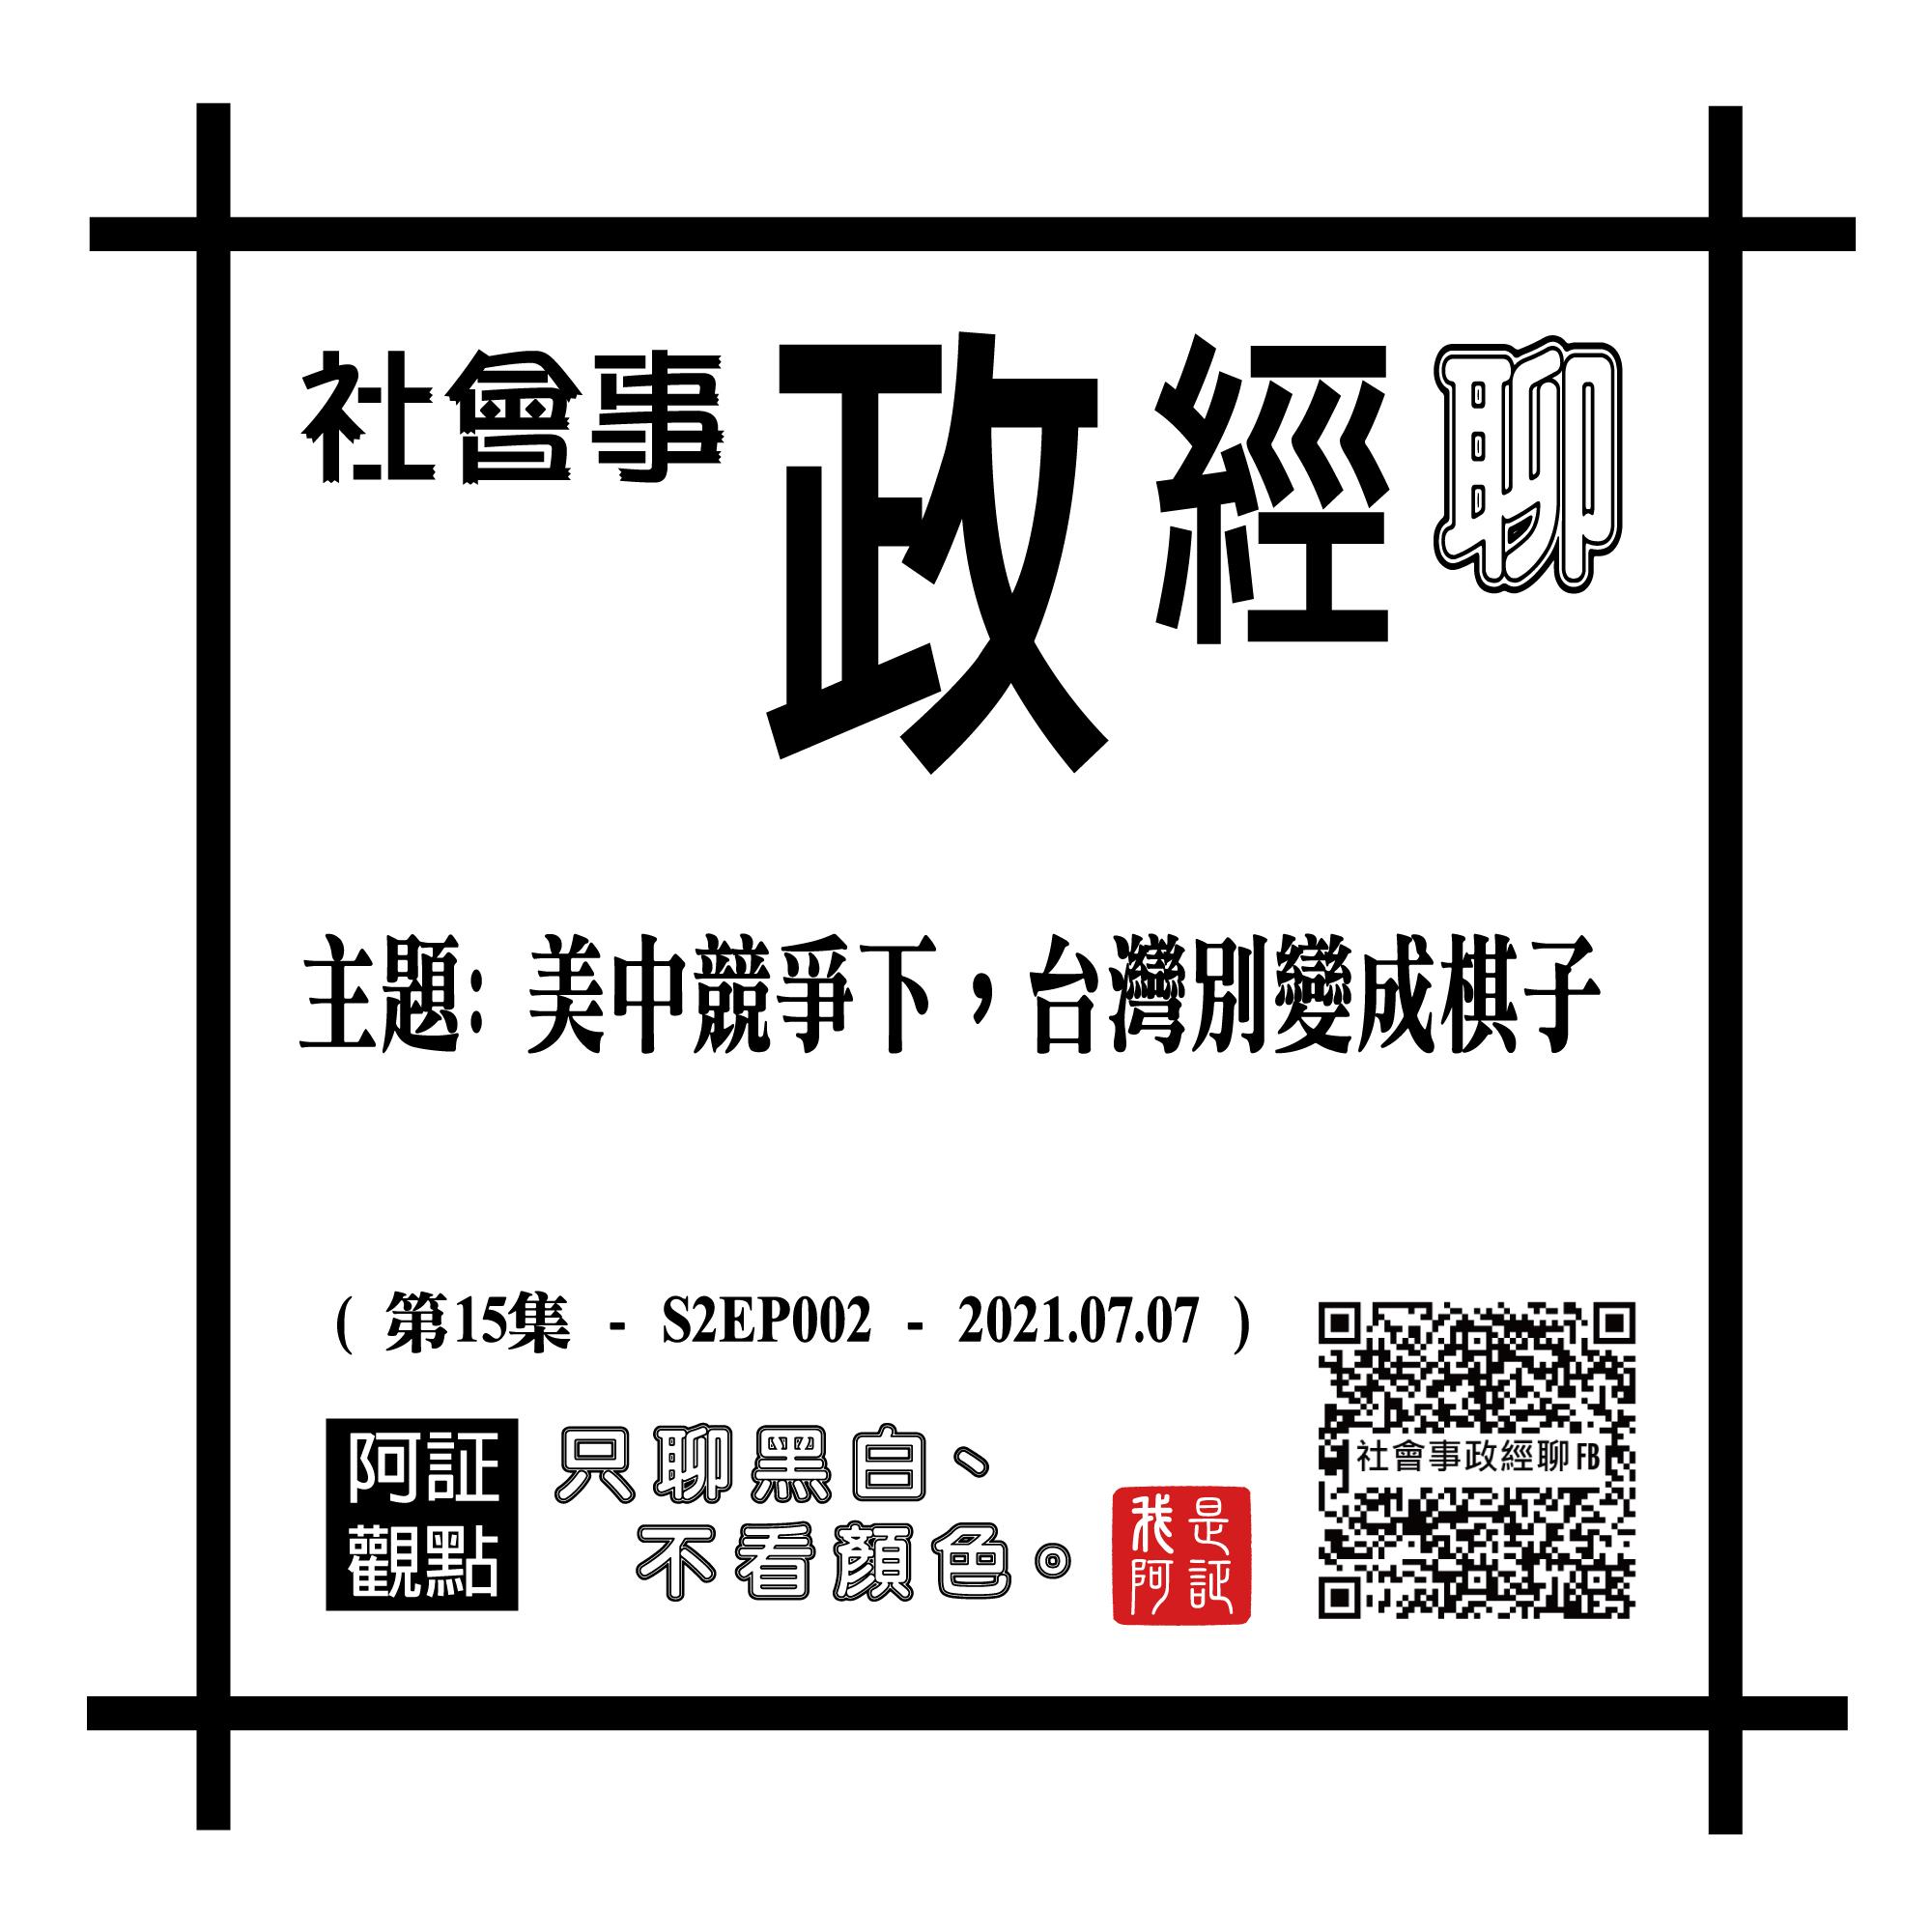 #15 l S2EP002 l 主題: 美中競爭下,台灣別變成棋子了。 (20210707-社會事政經聊第15集)